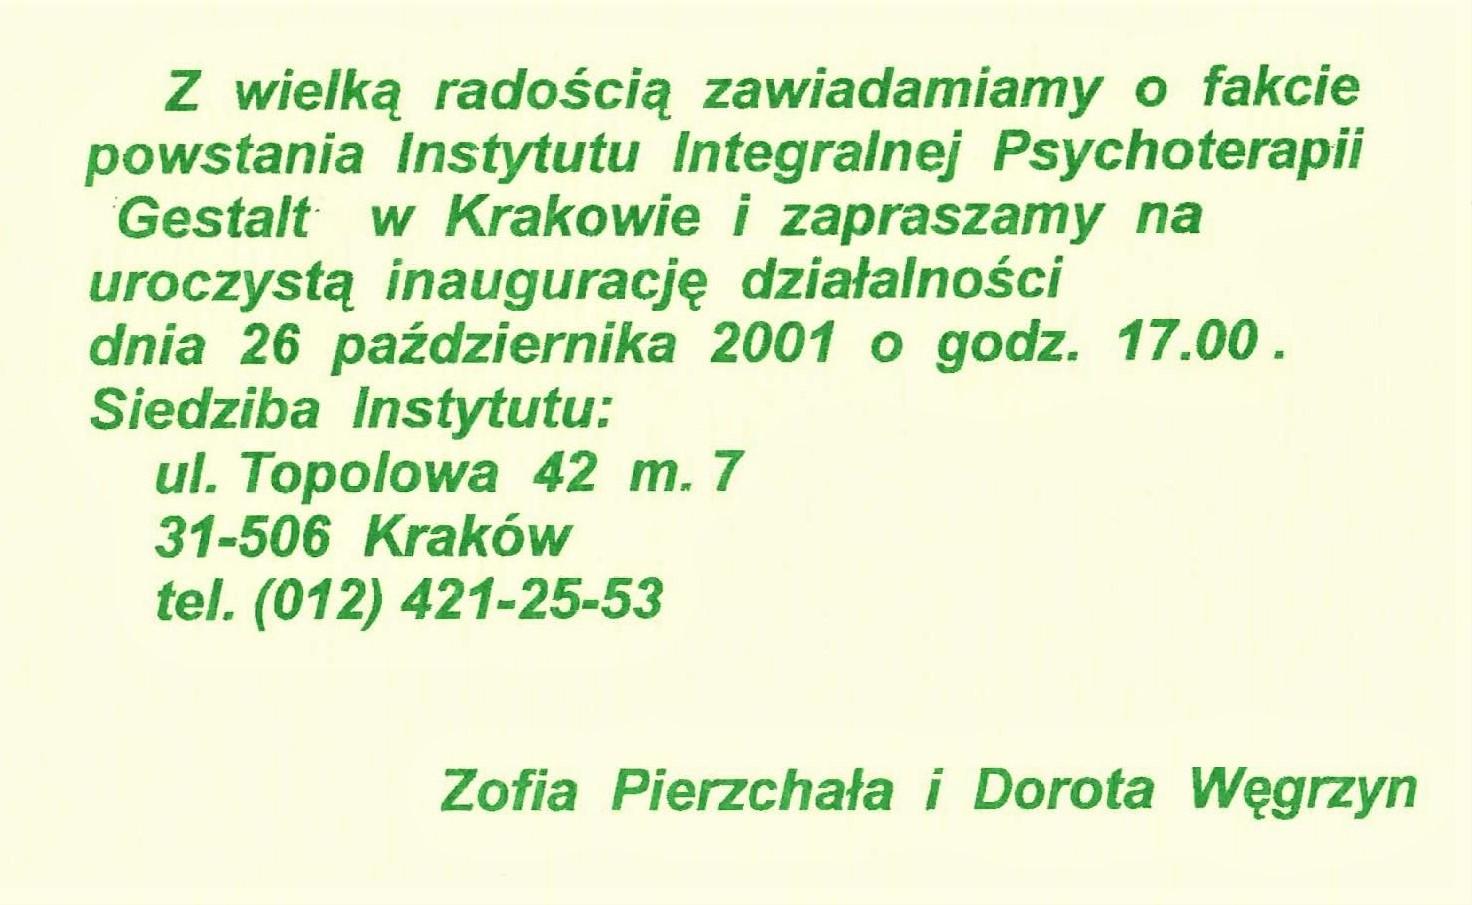 Otwarcie Instytutu Integralnej Psychoterapii Gestalt